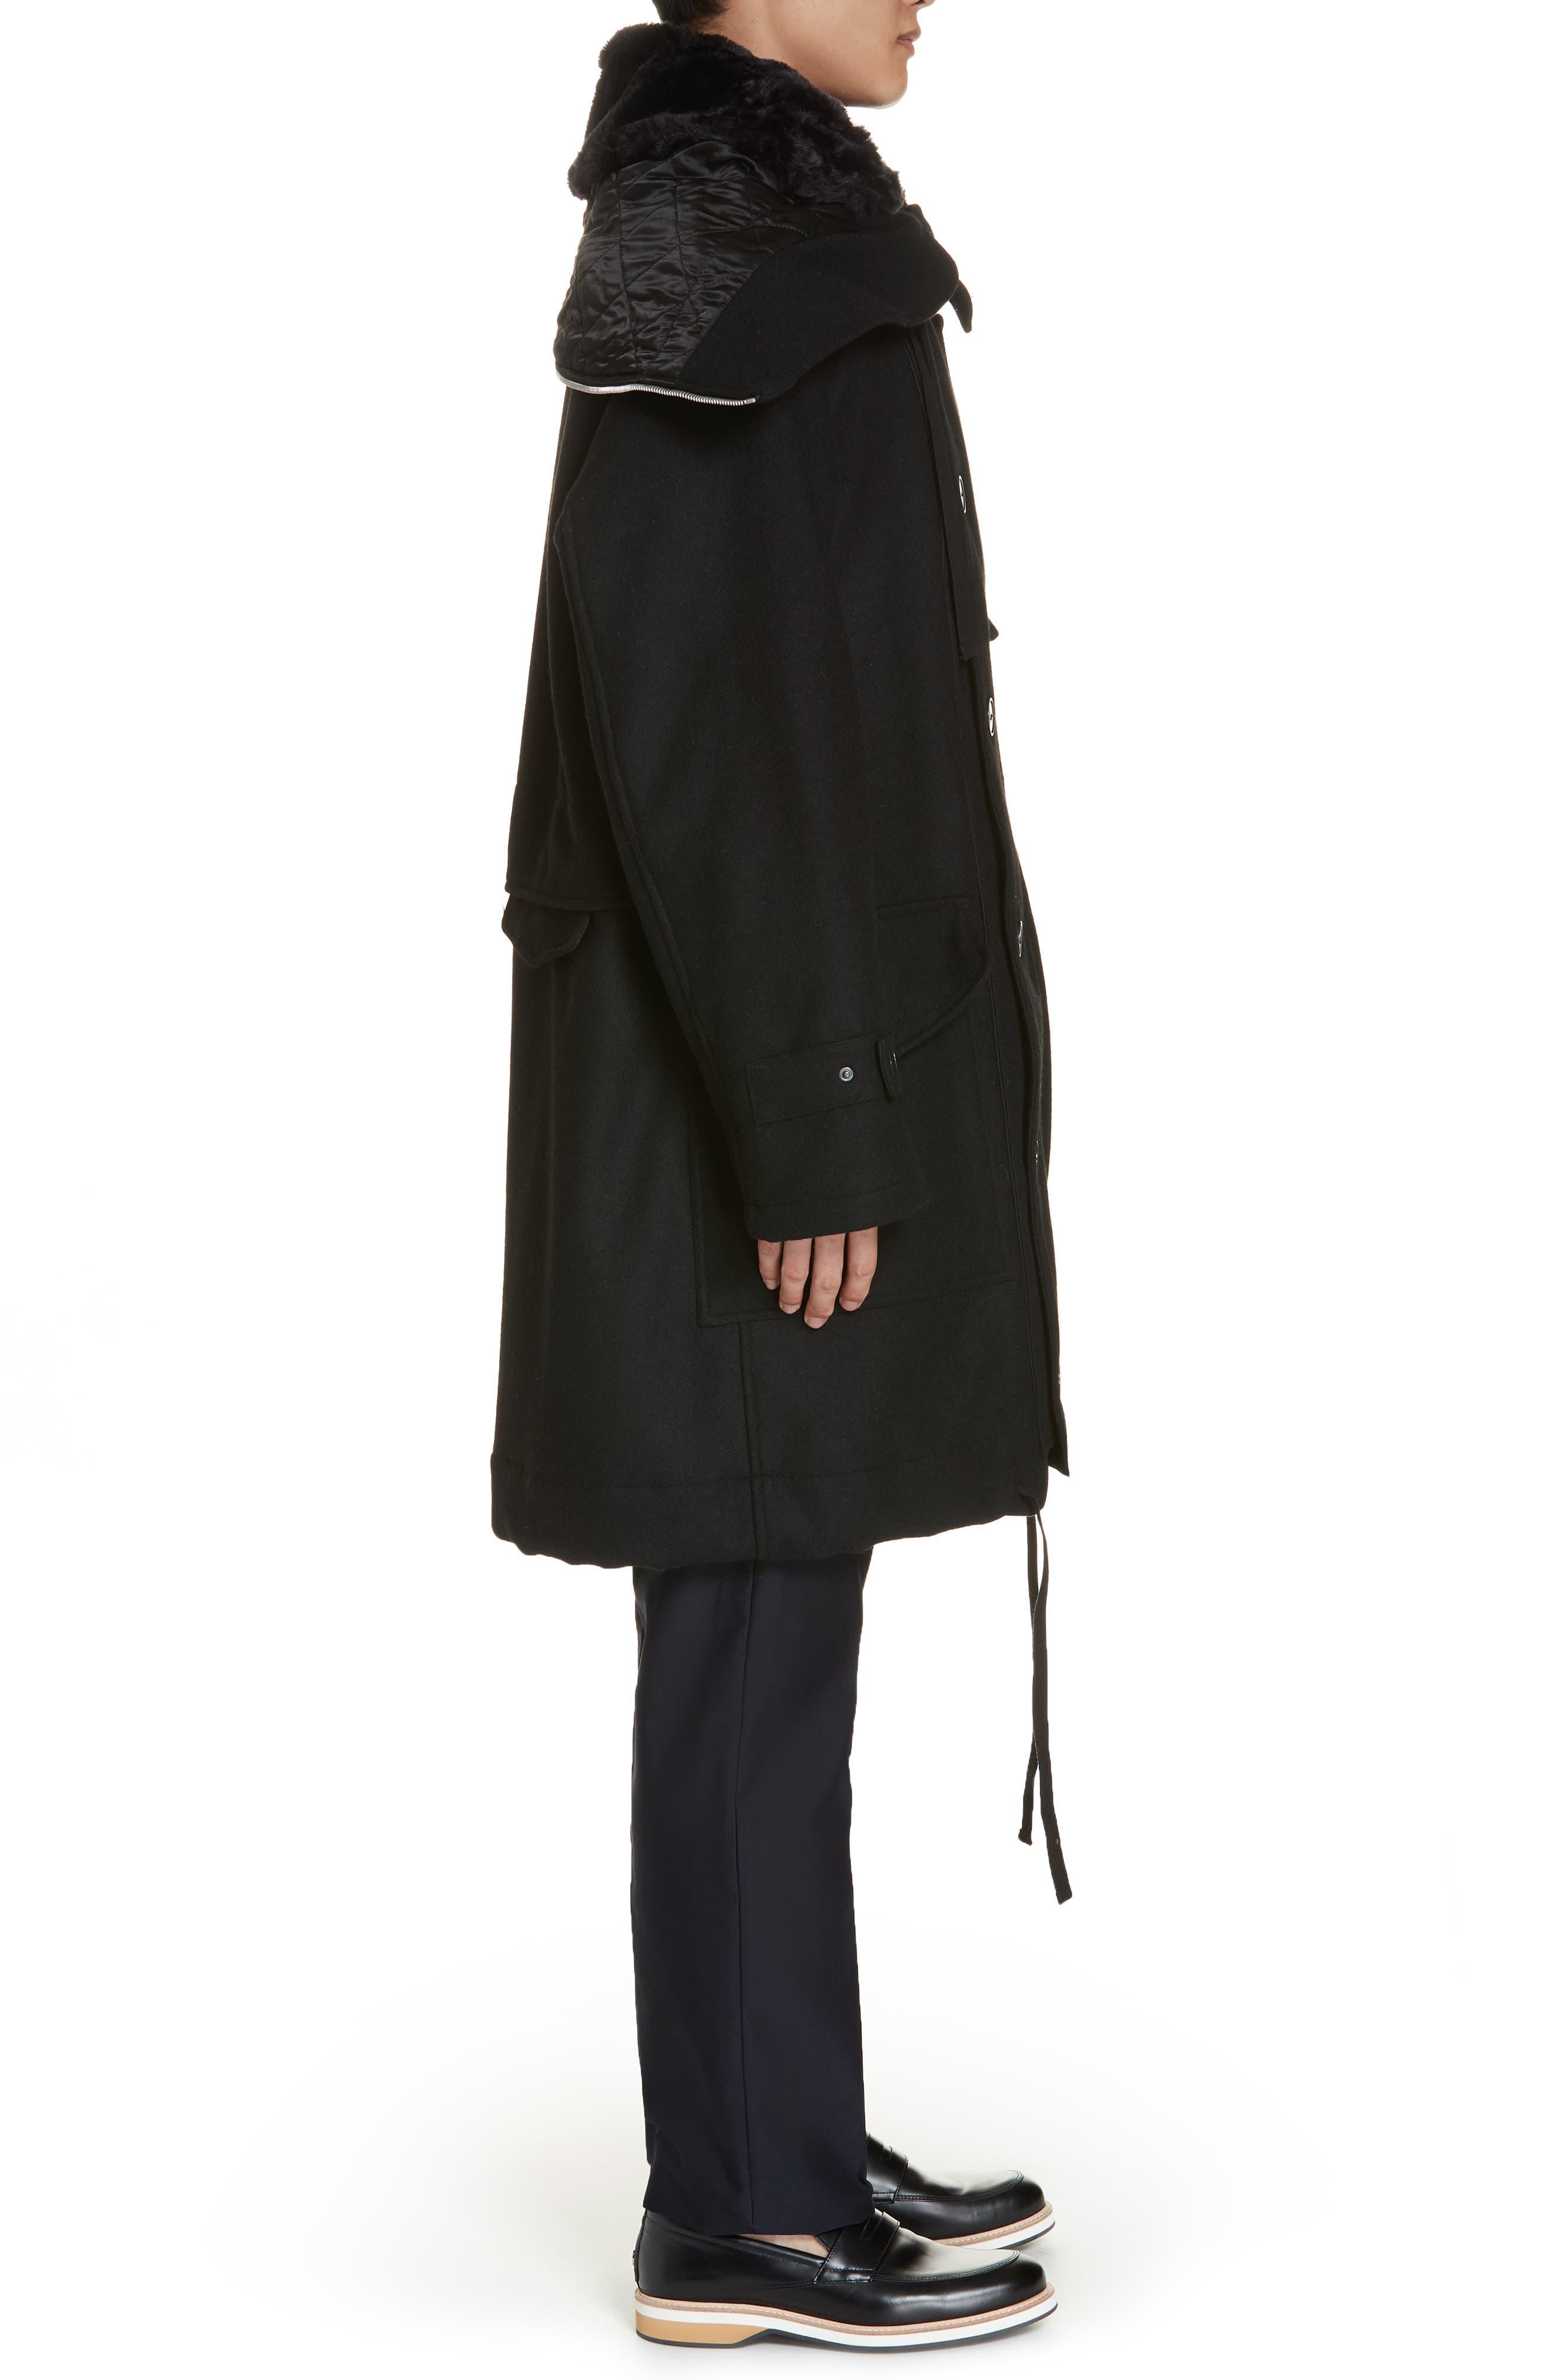 Verreli Hooded Parka with Faux Fur Trim,                             Alternate thumbnail 4, color,                             BLACK 900